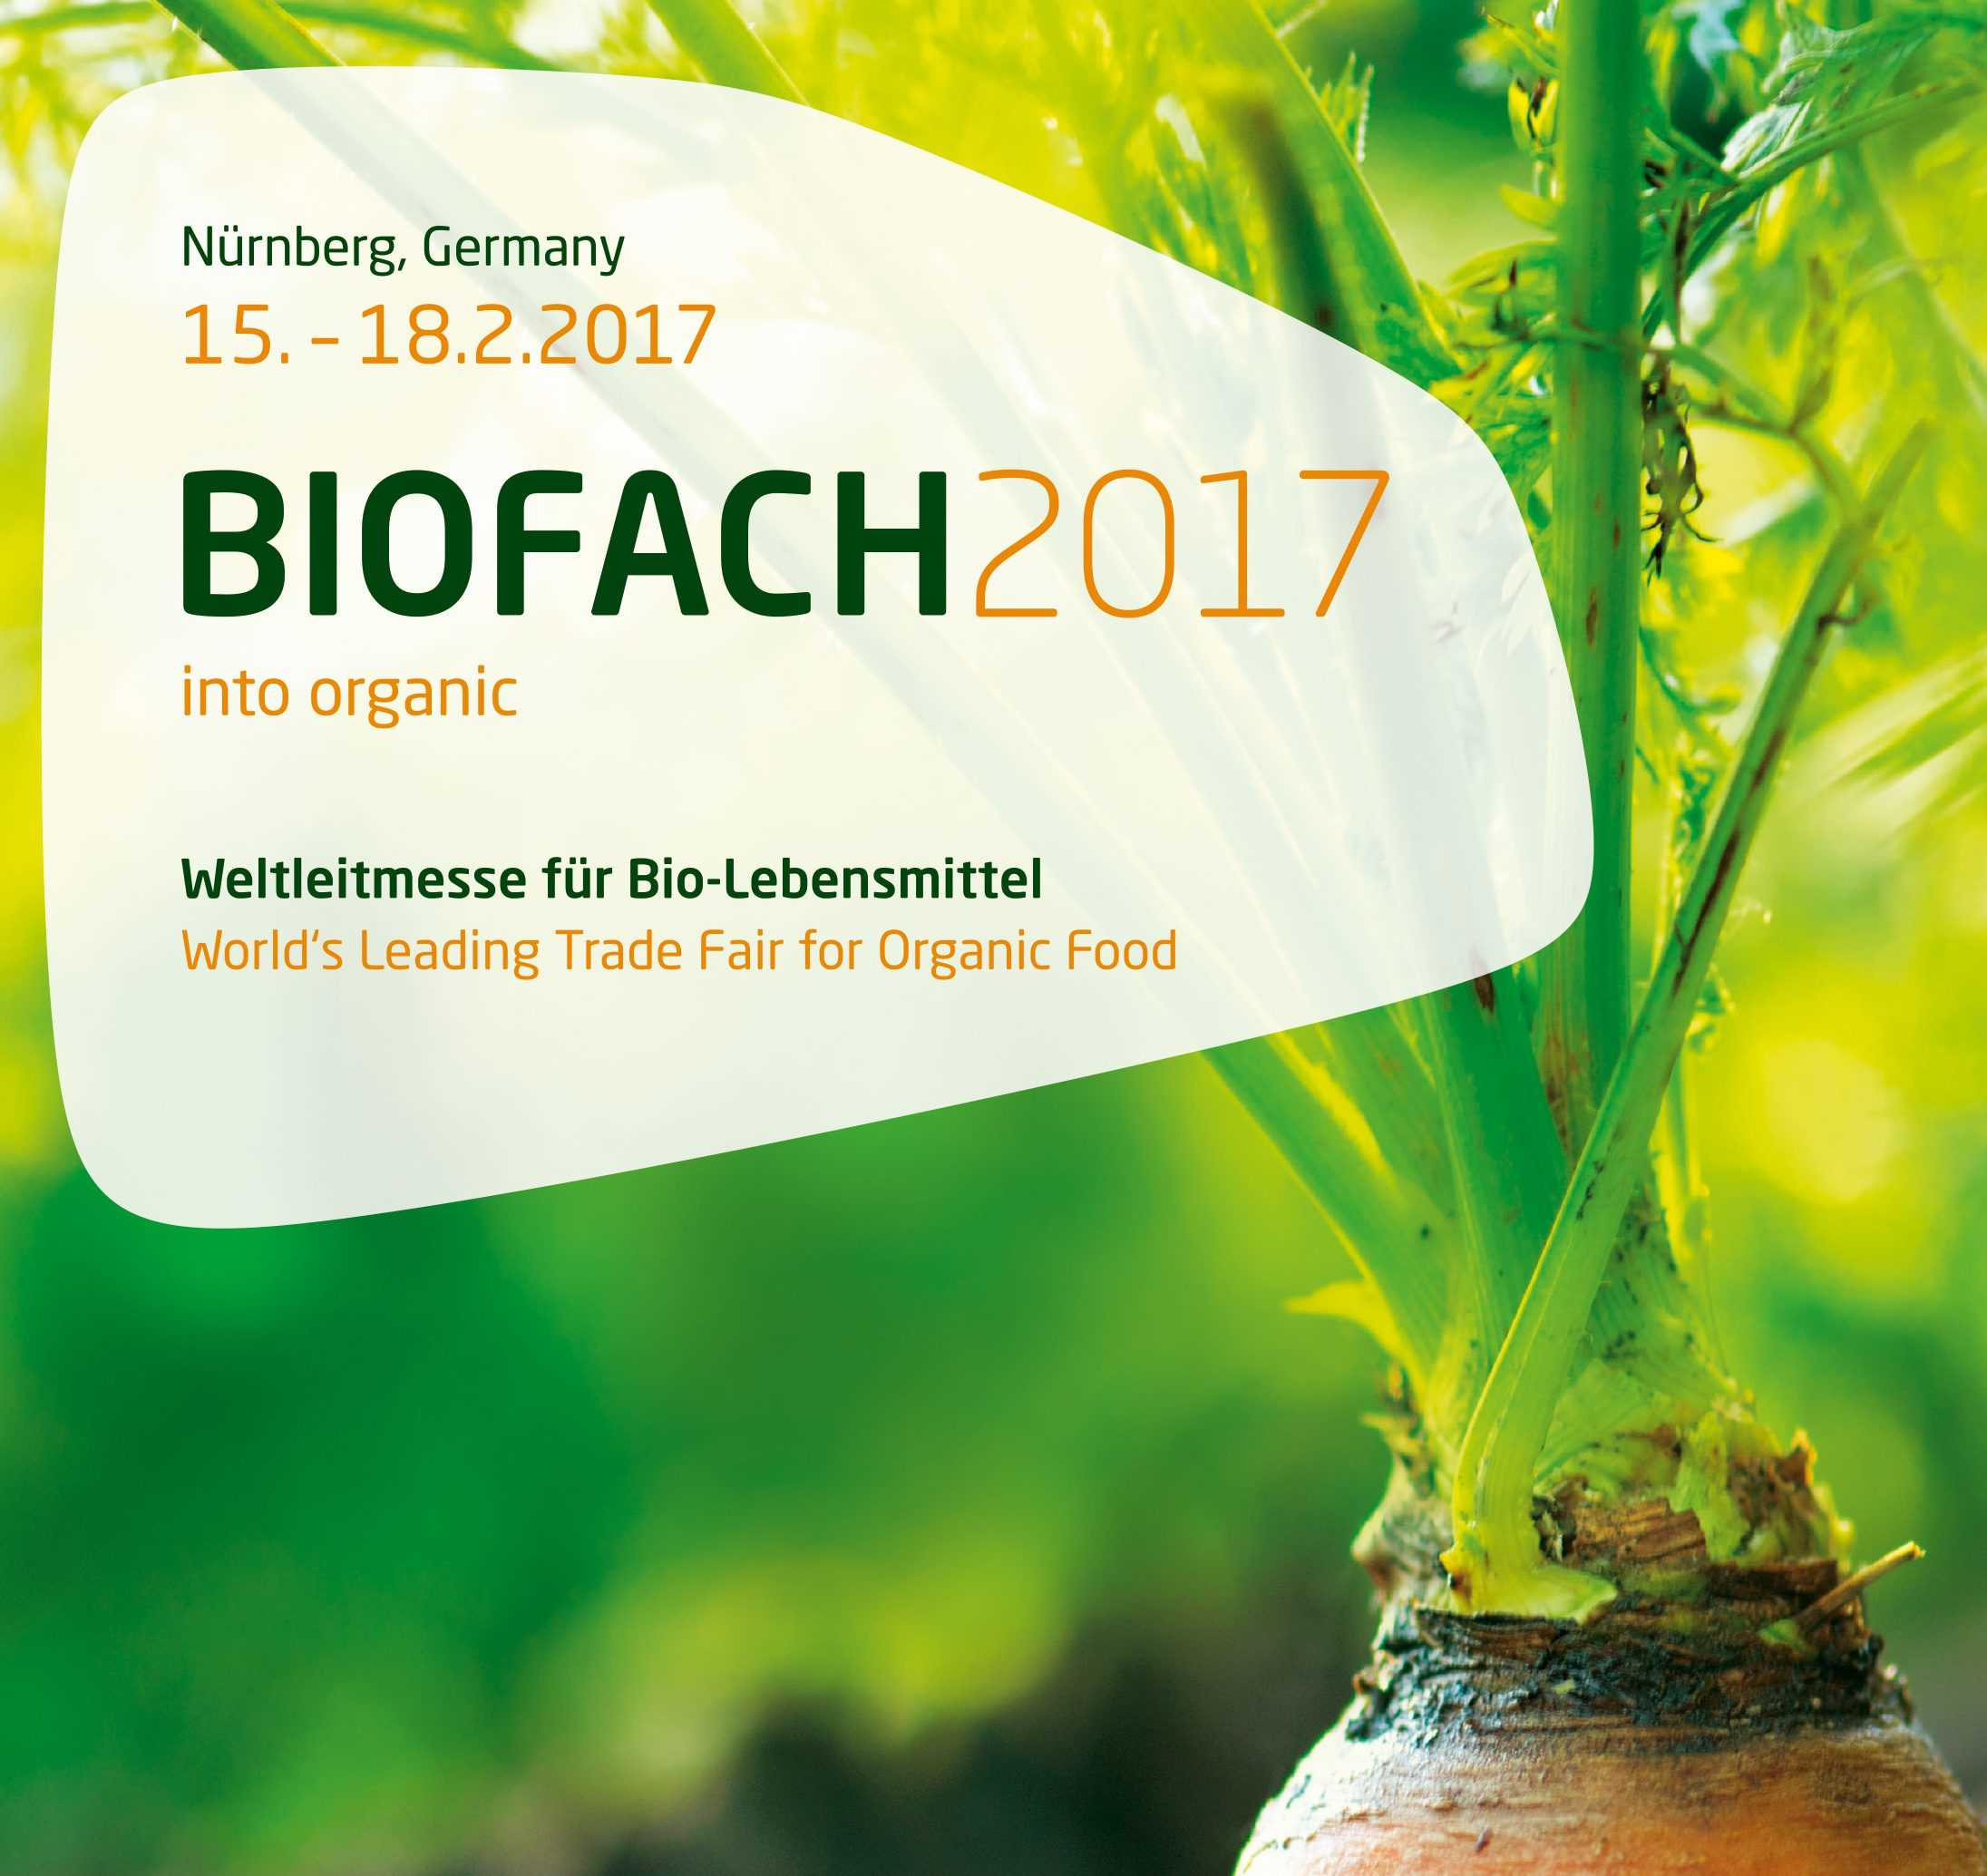 Biofach 2017 – into organic